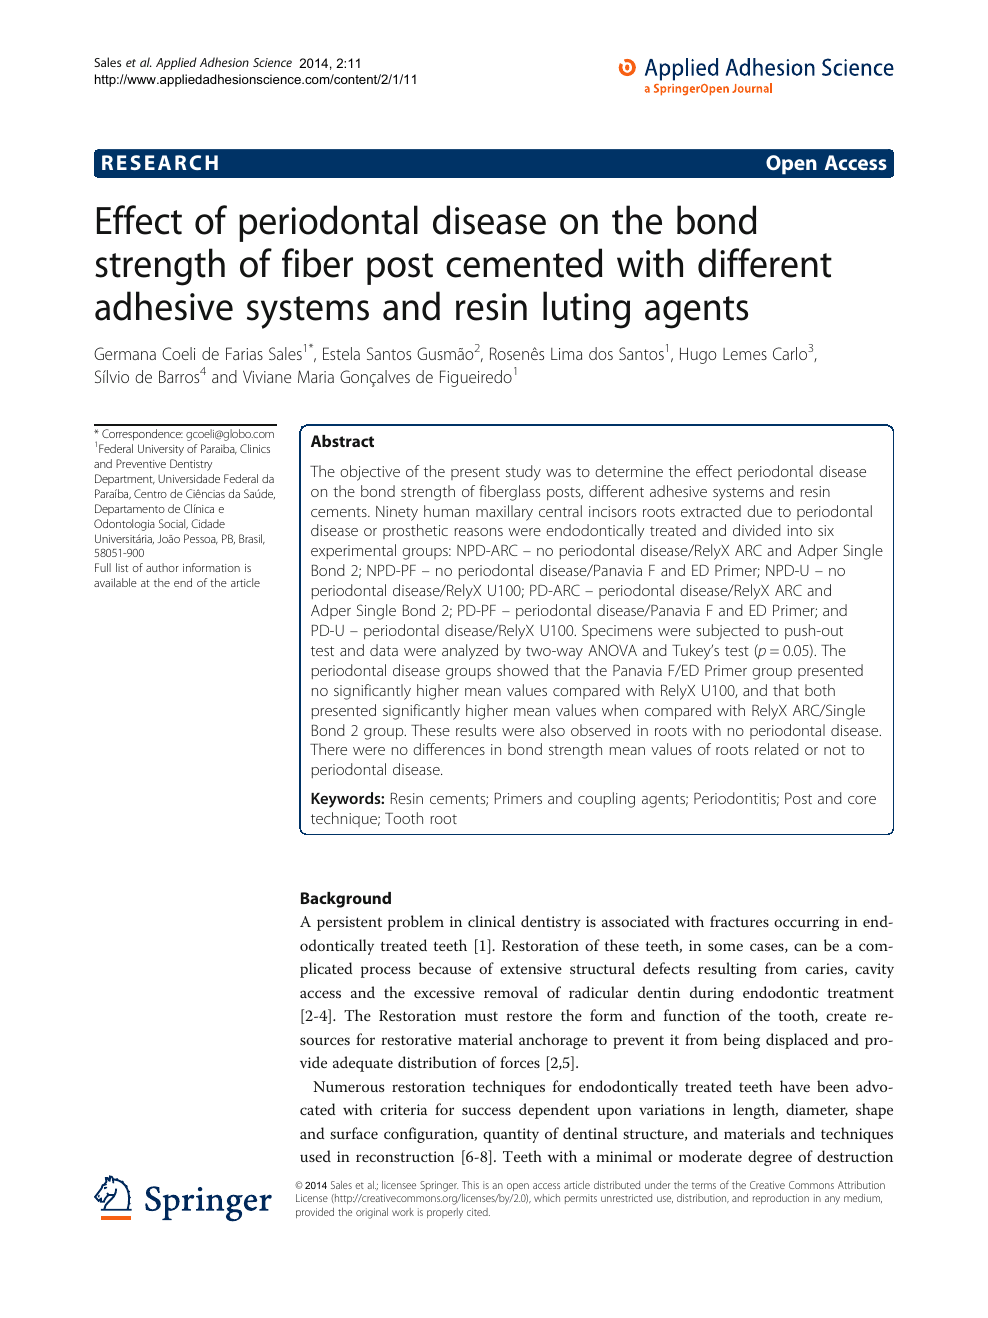 Effect Of Periodontal Disease On The Bond Strength Fiber Post